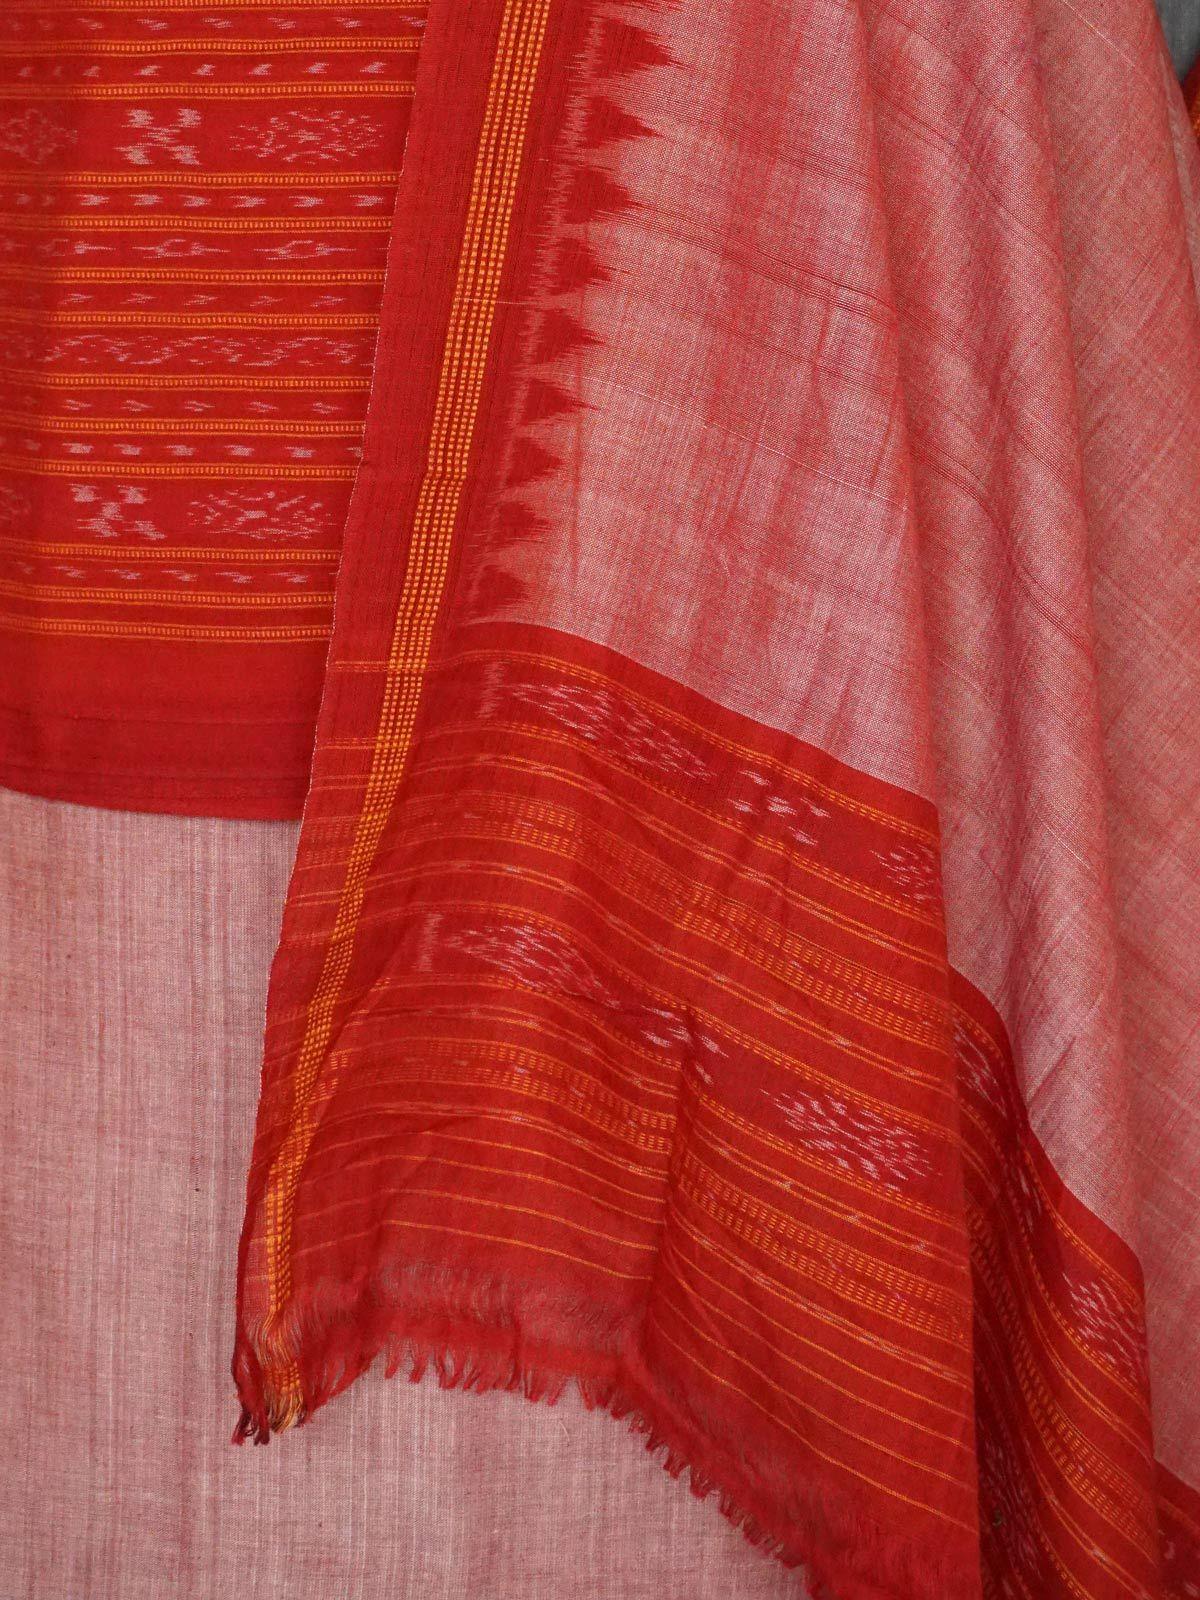 Burnt orange ikat cotton dress material with dupatta